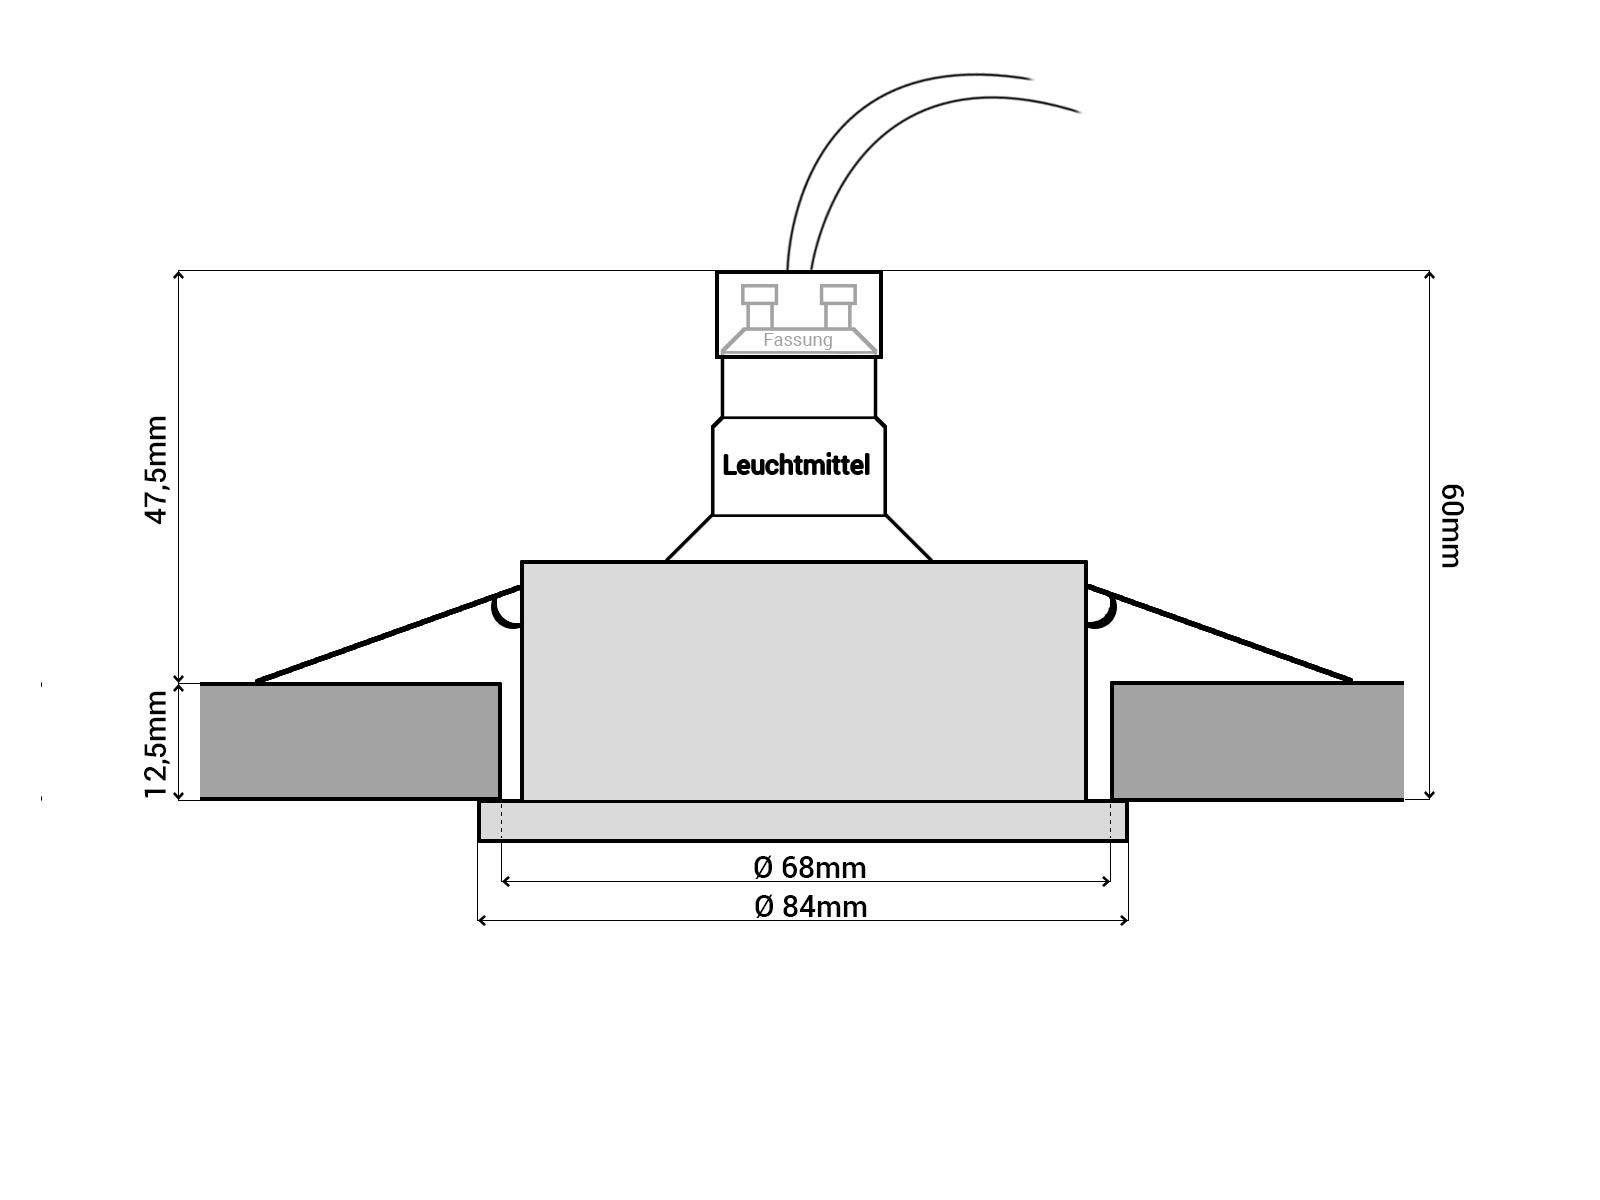 rw 1 led einbauspot chrom matt dimmbar bad dusche ip65 ledon - Led Strahler In Der Dusche